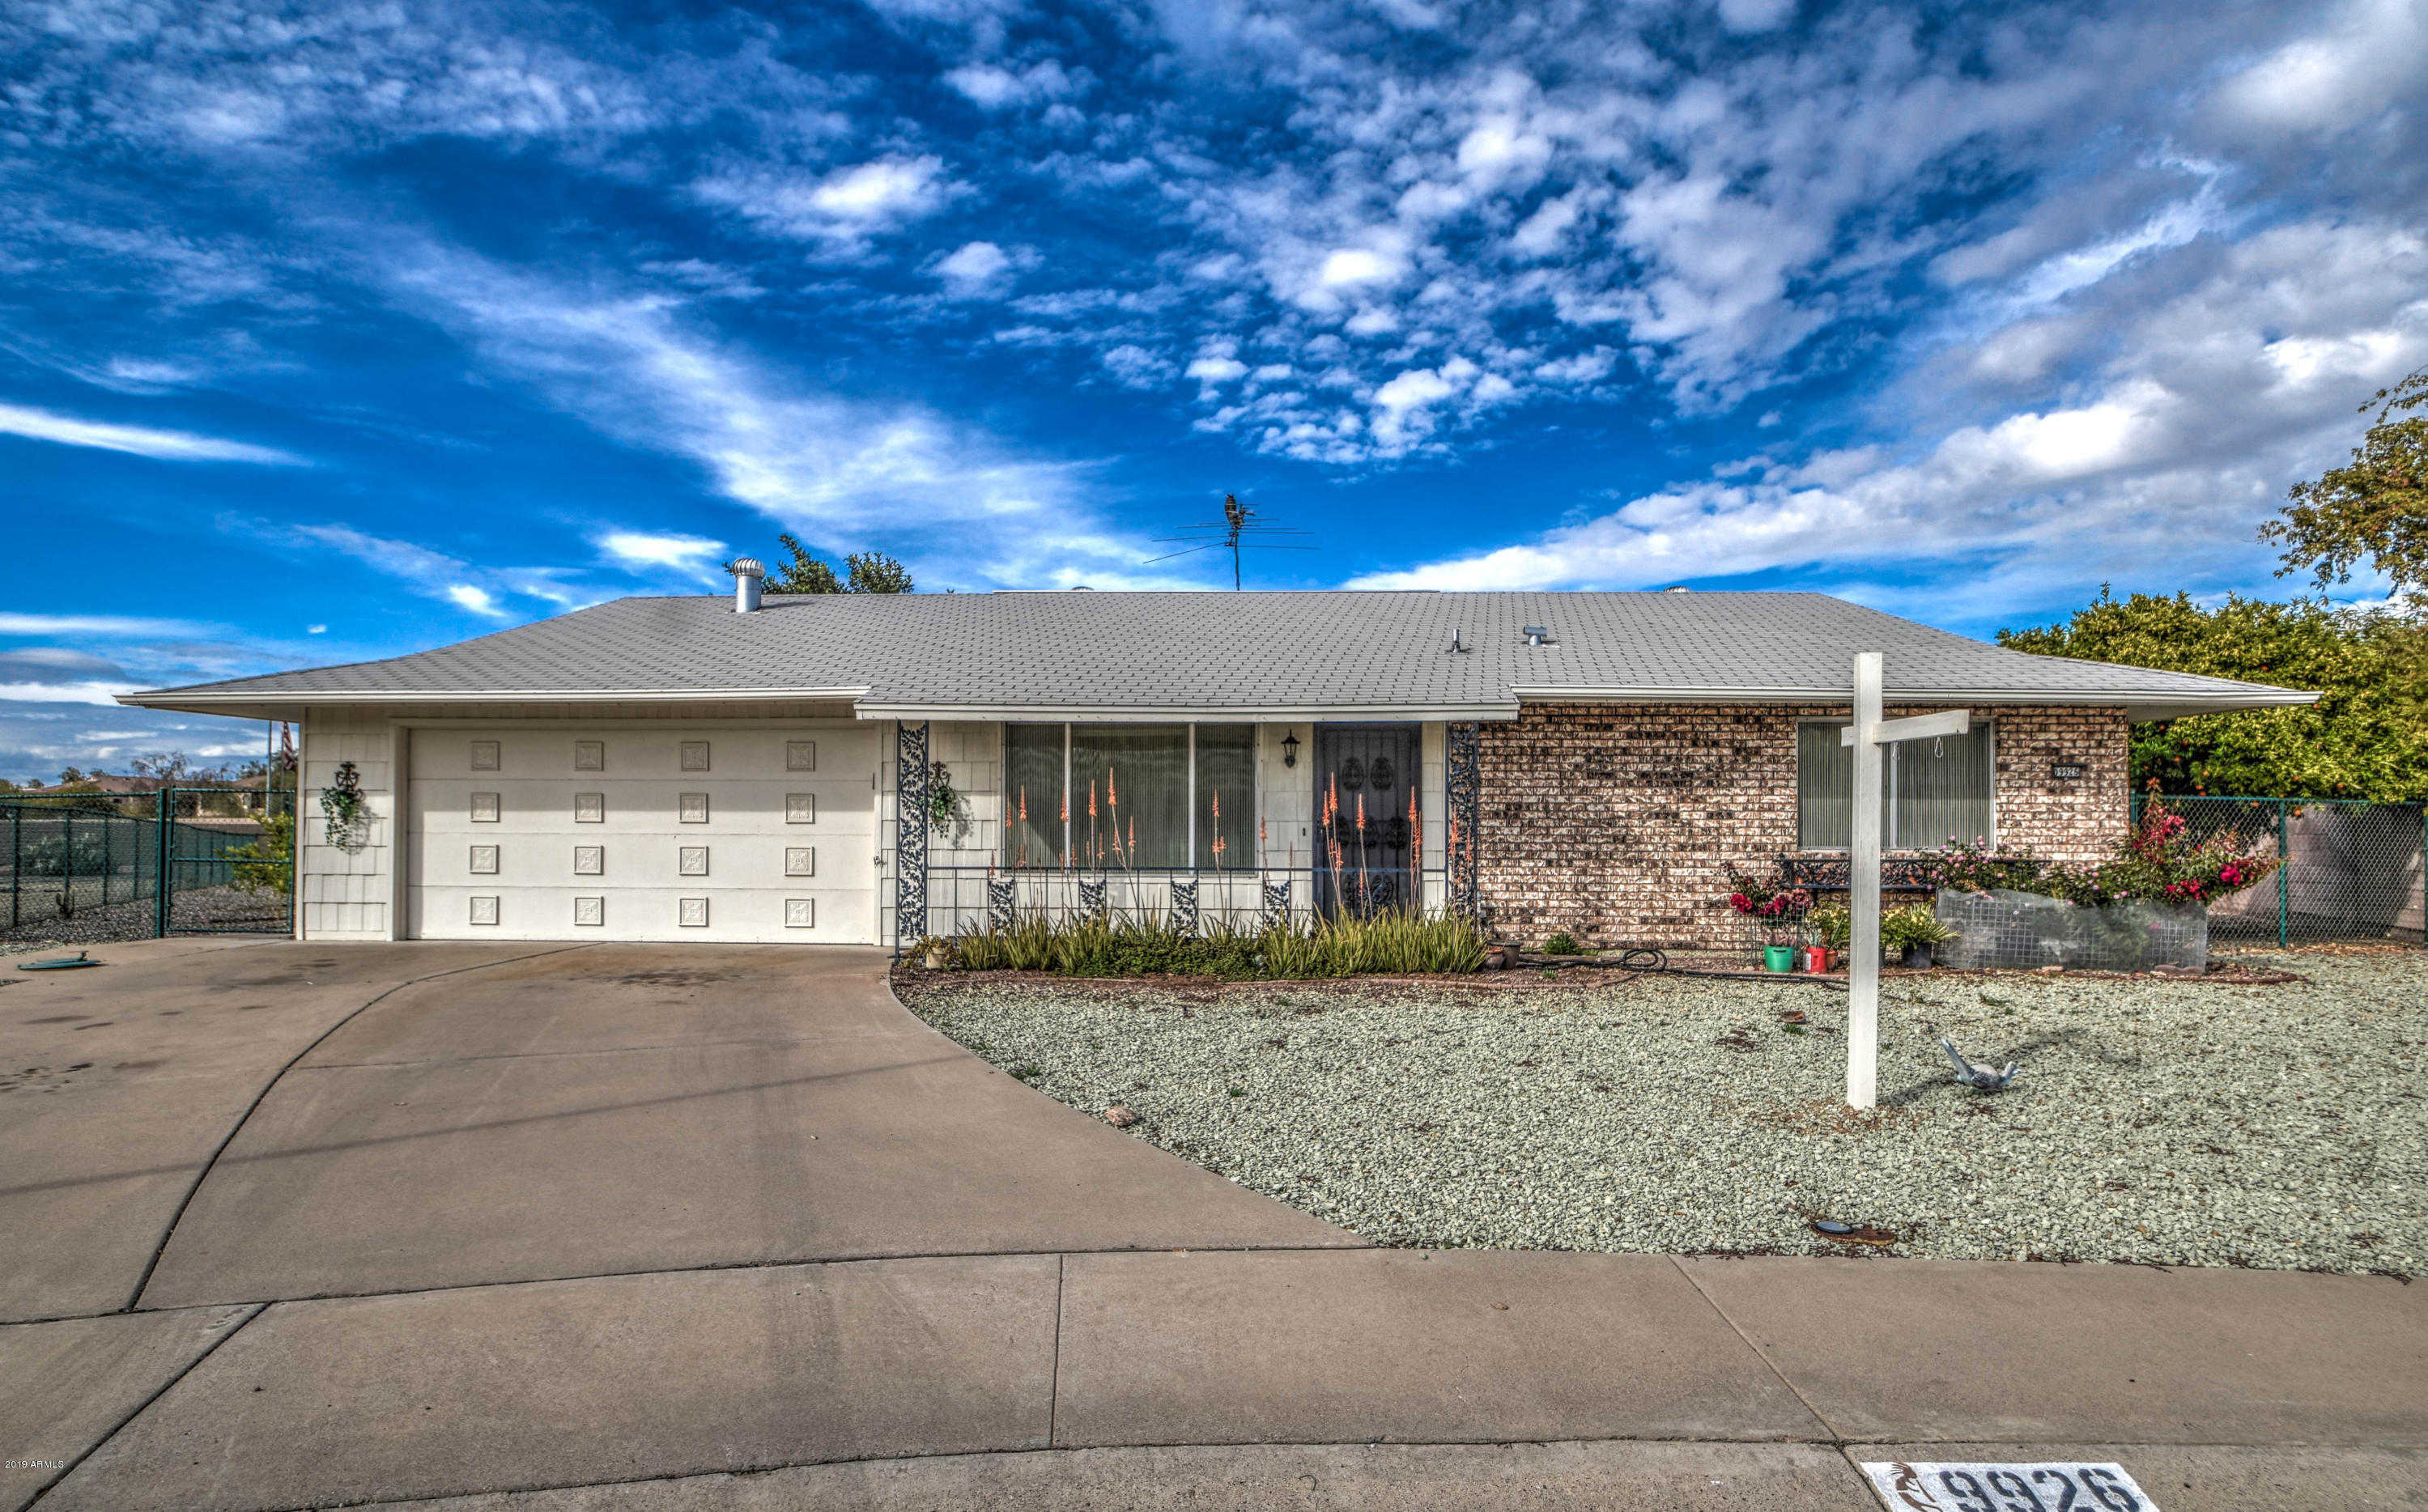 $200,000 - 3Br/2Ba - Home for Sale in Sun City 52 Lot 1-227 & Tr A-c, Sun City